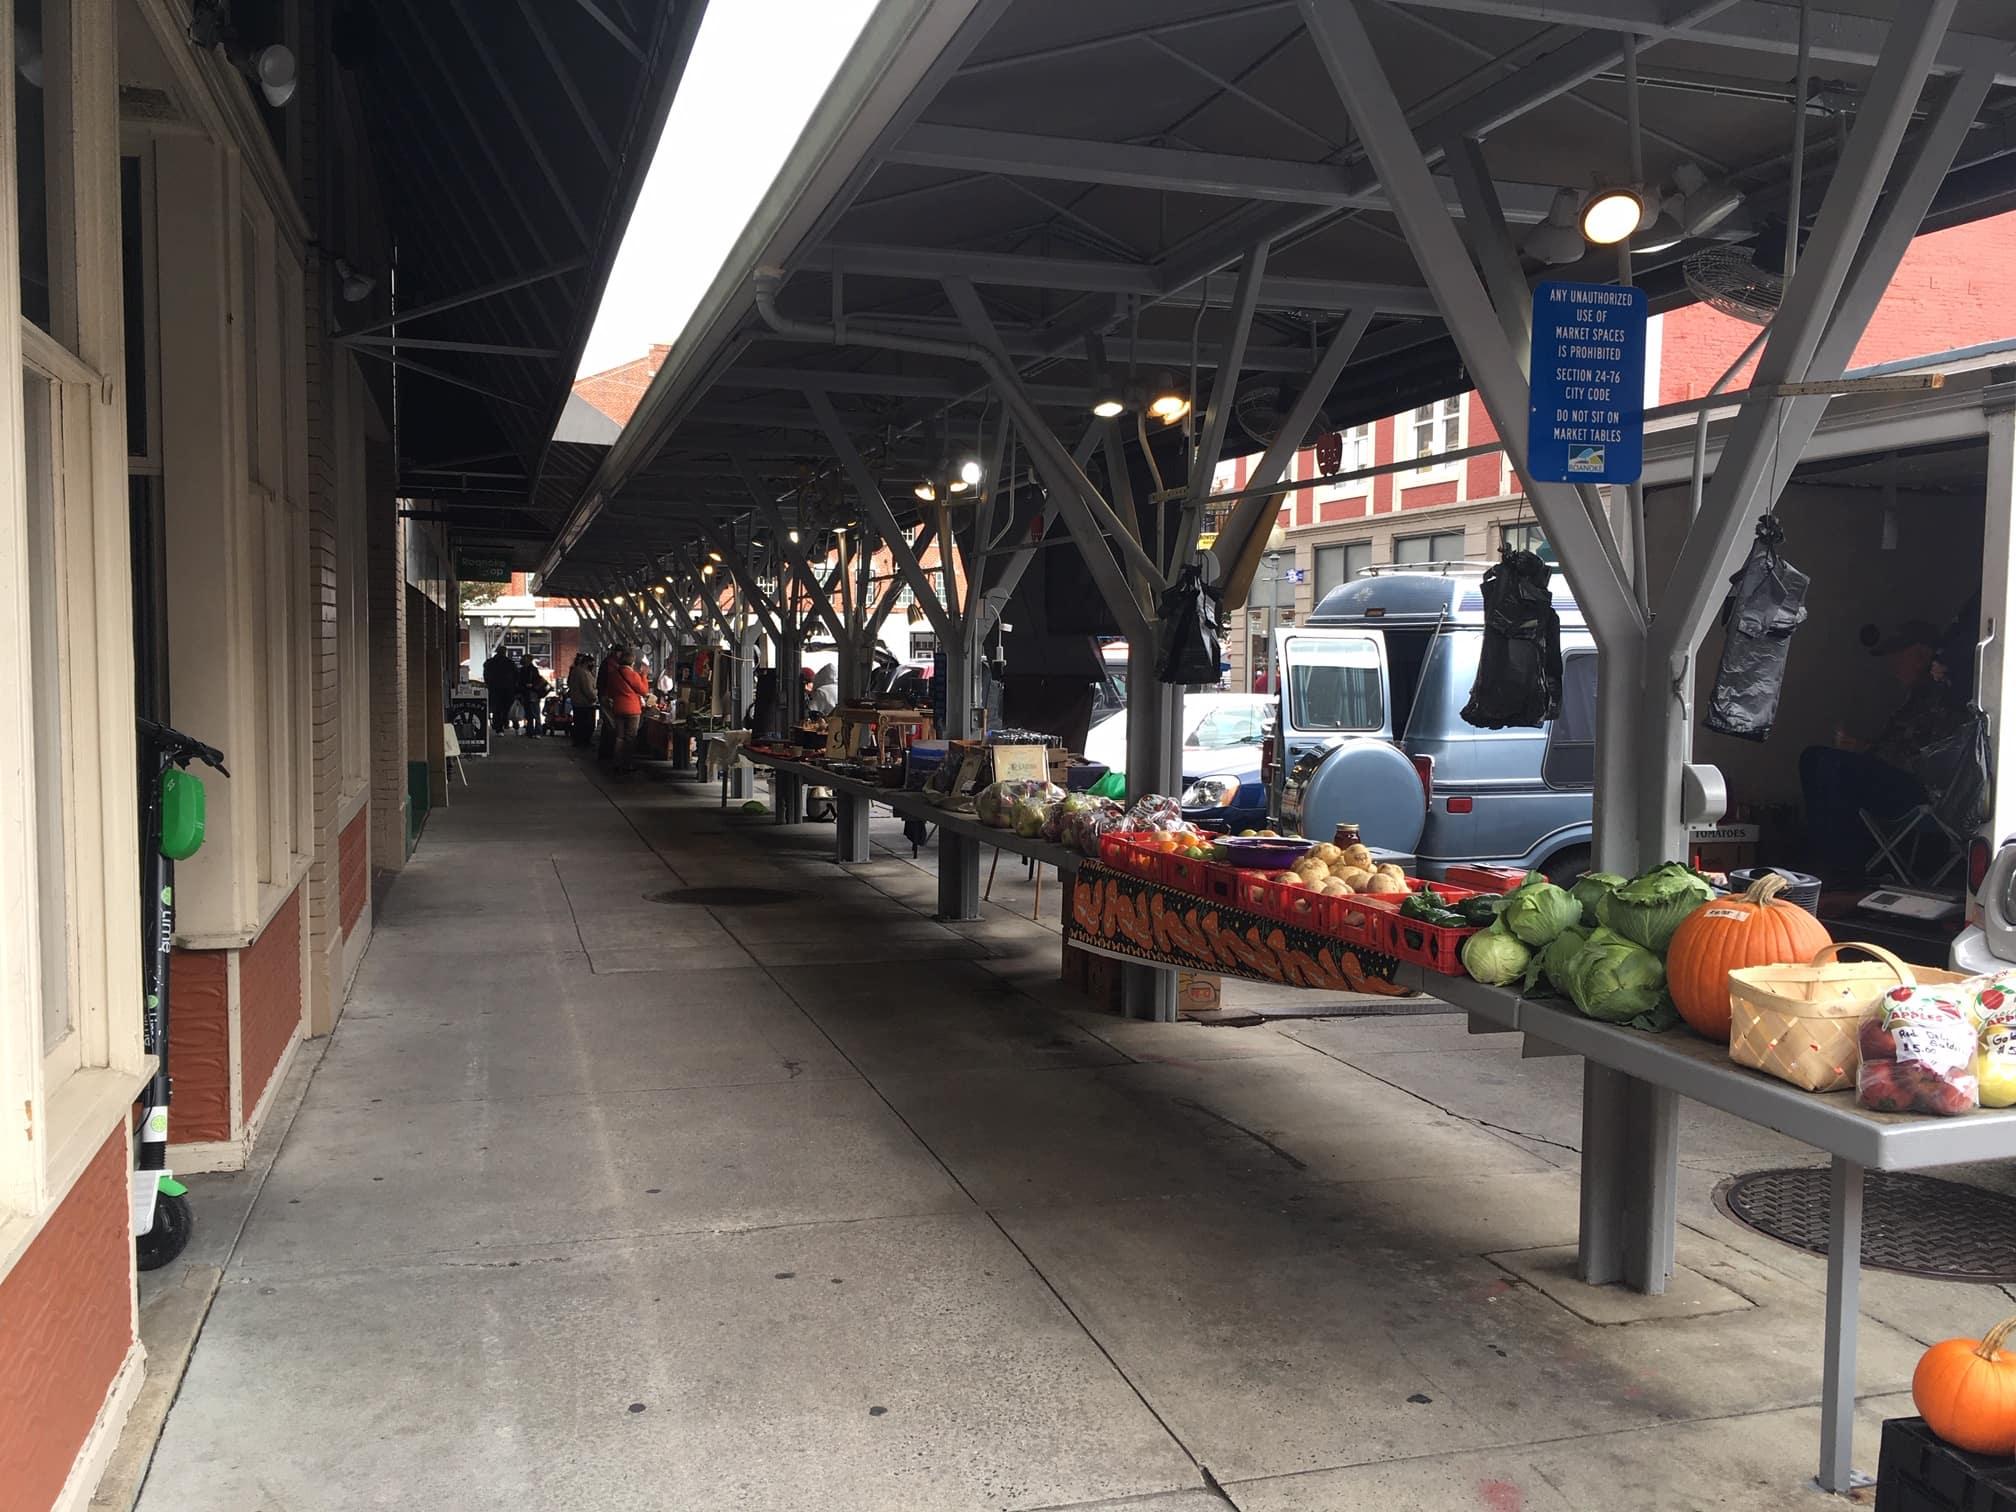 Downtown Roanoke Vendor Rows